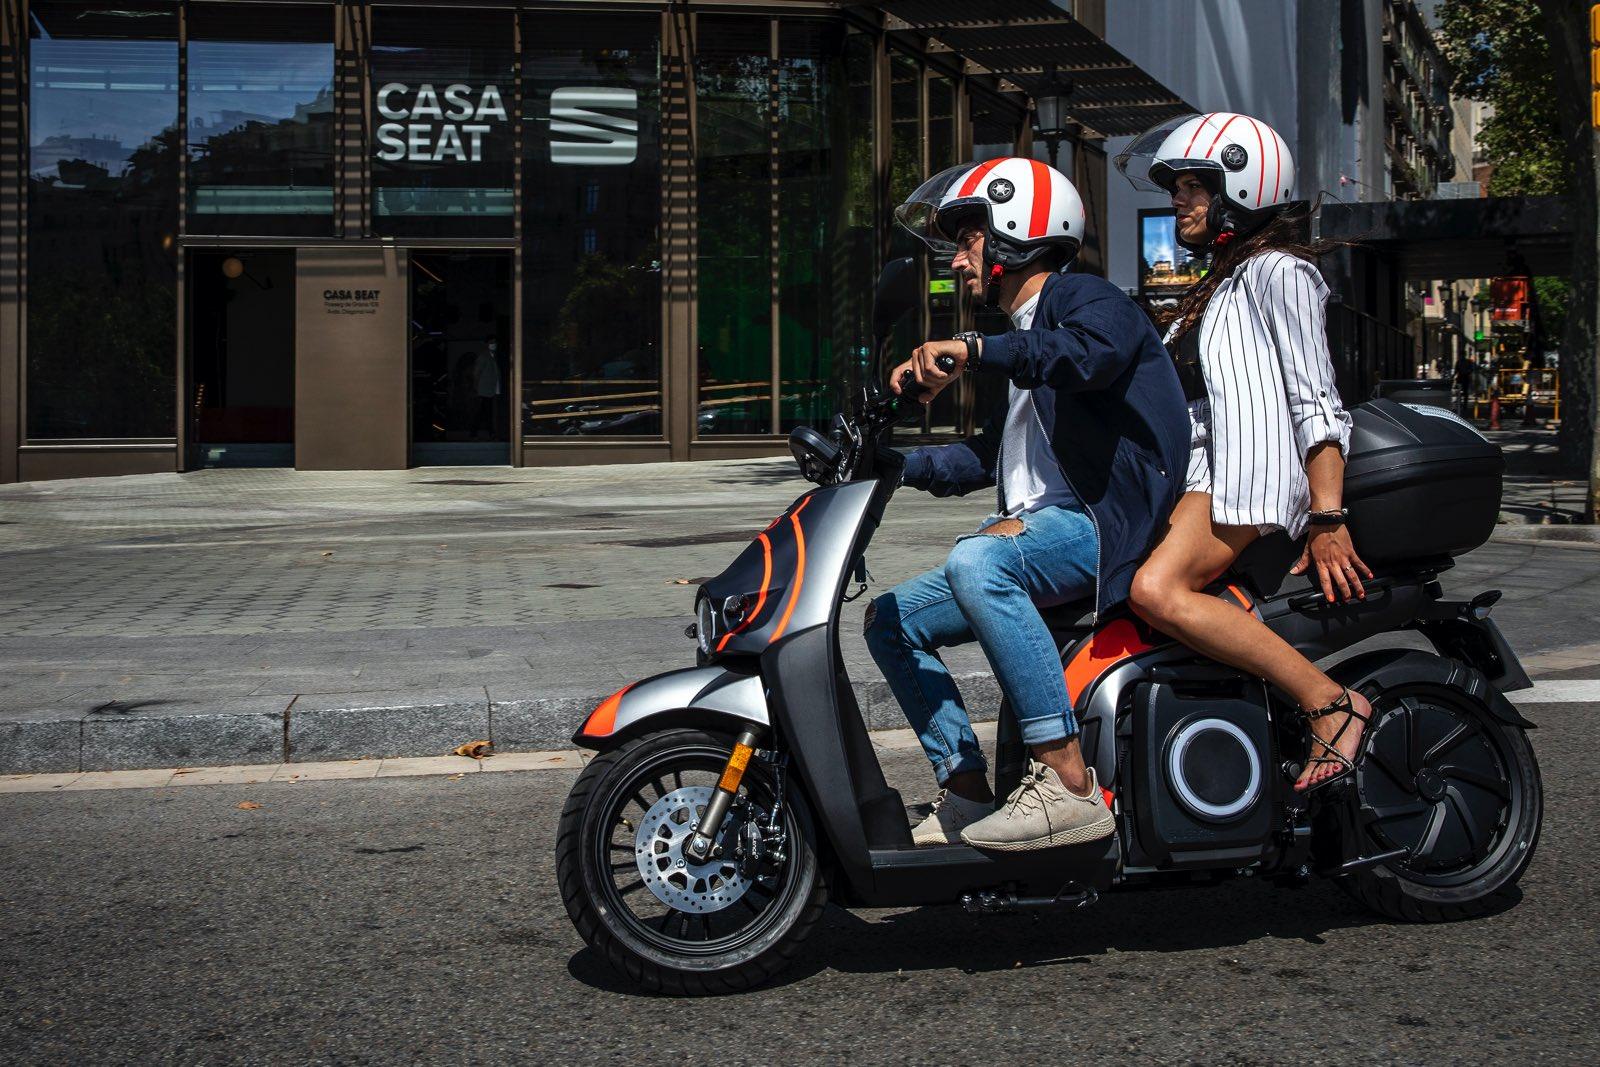 Seat Mó motosharing